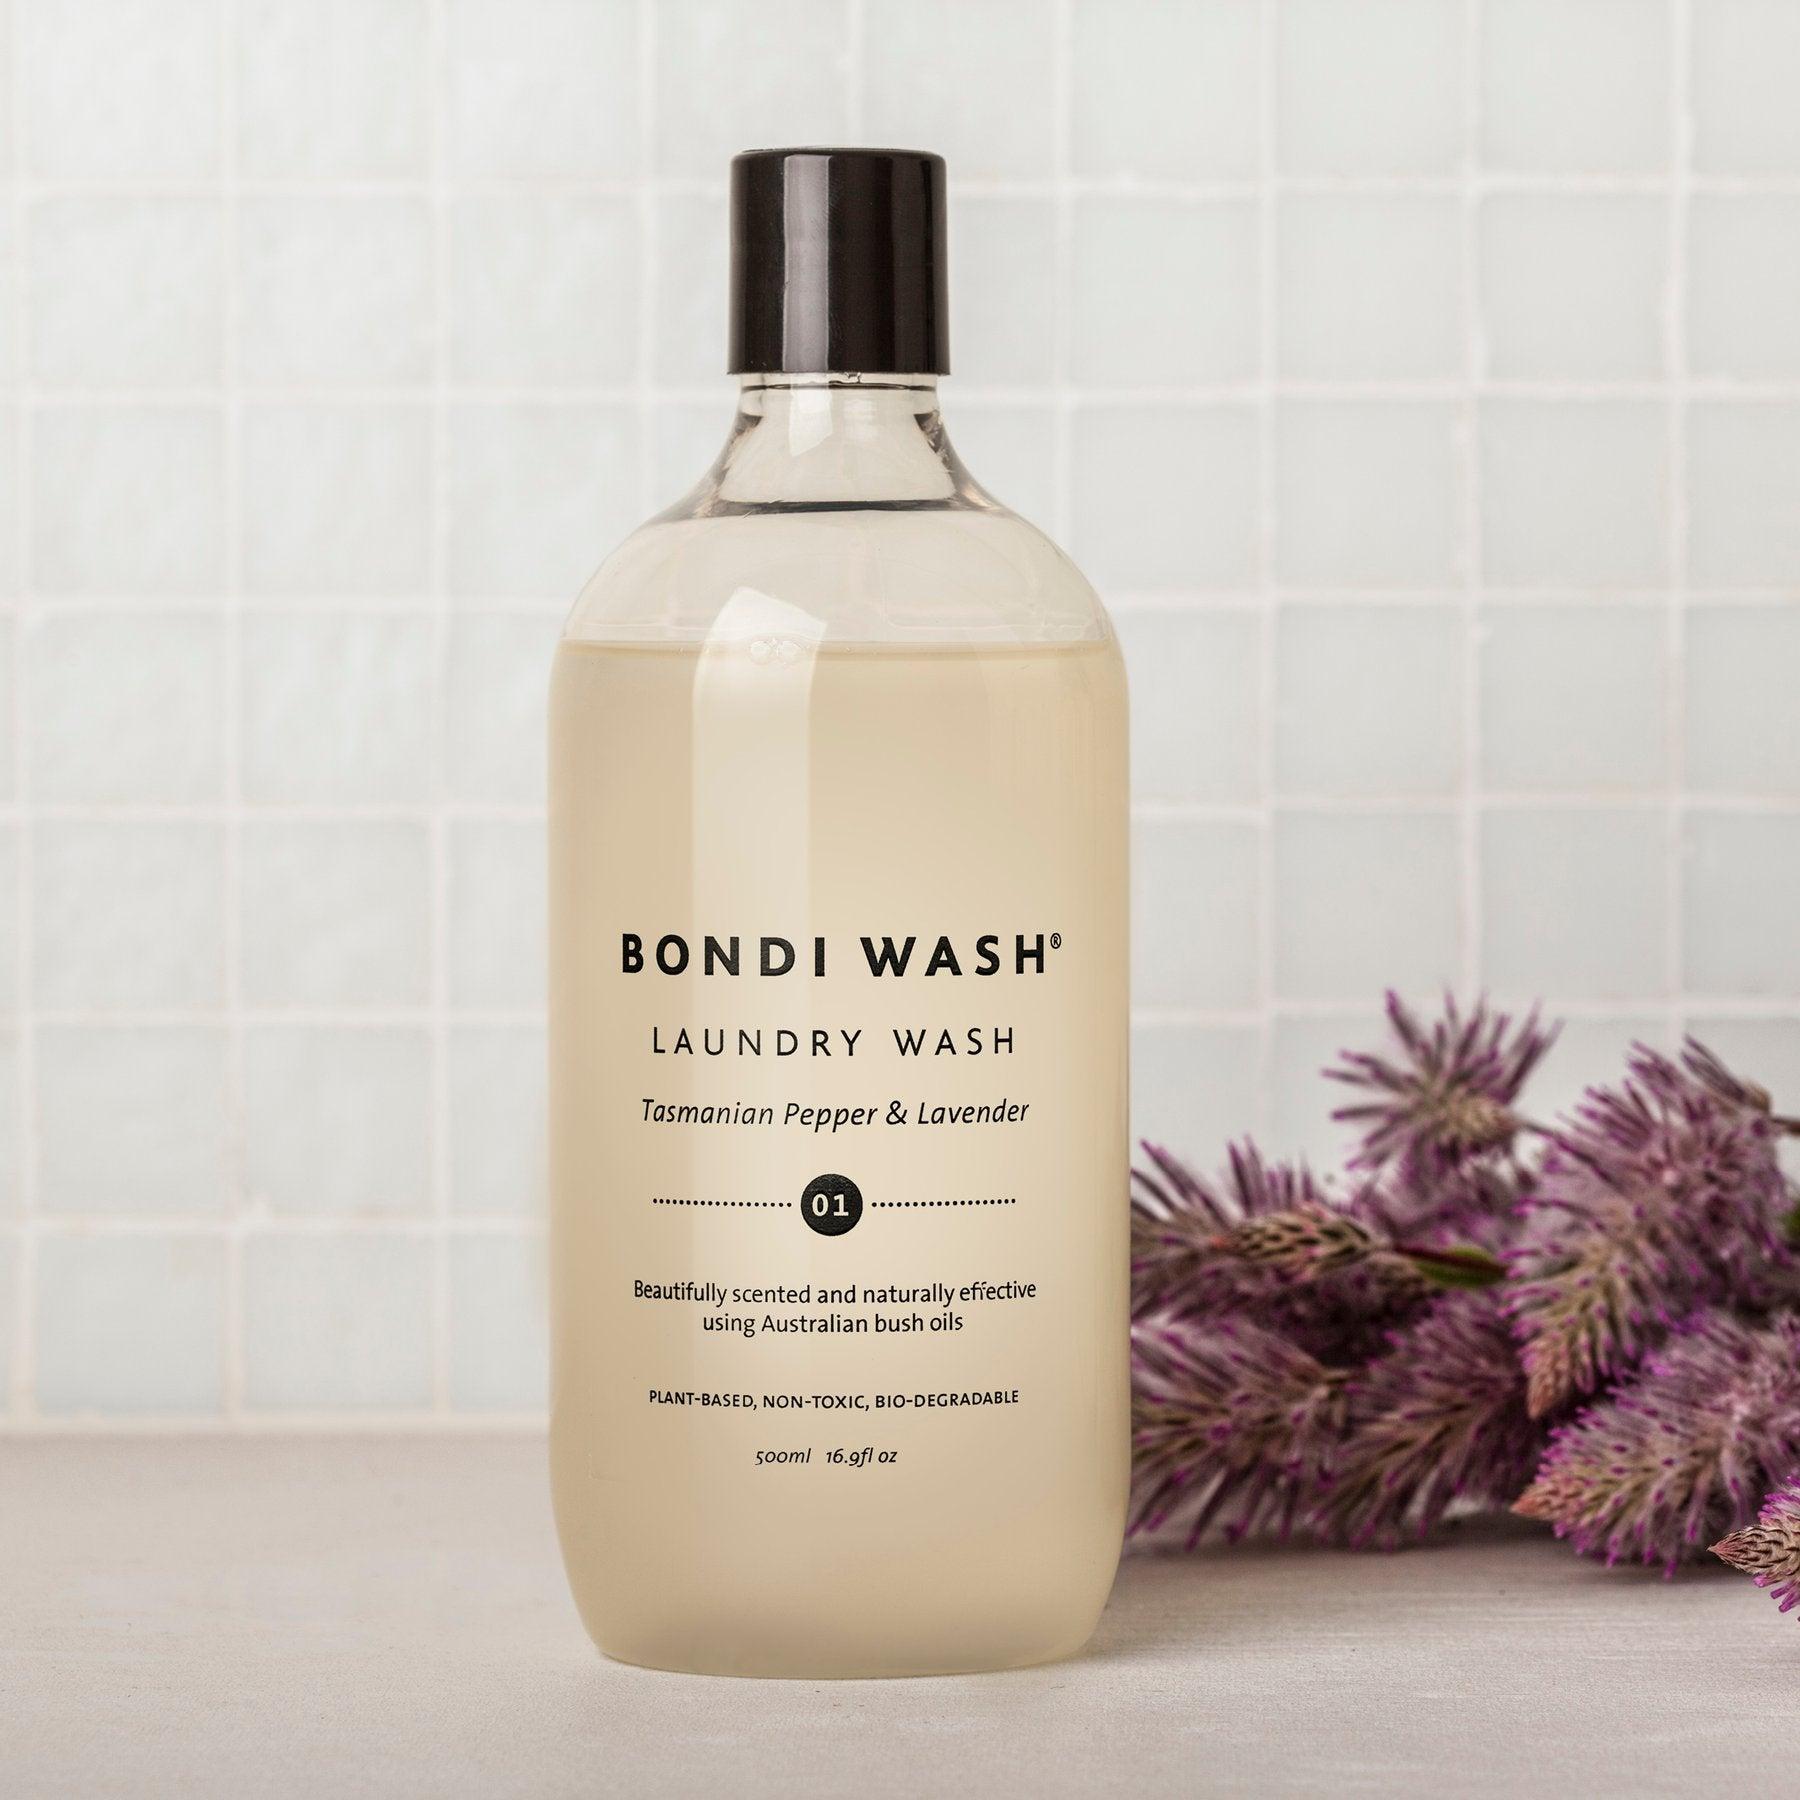 BONDI WASH LAUNDRY WASH - TASMANIAN PEPPER & LAVENDER